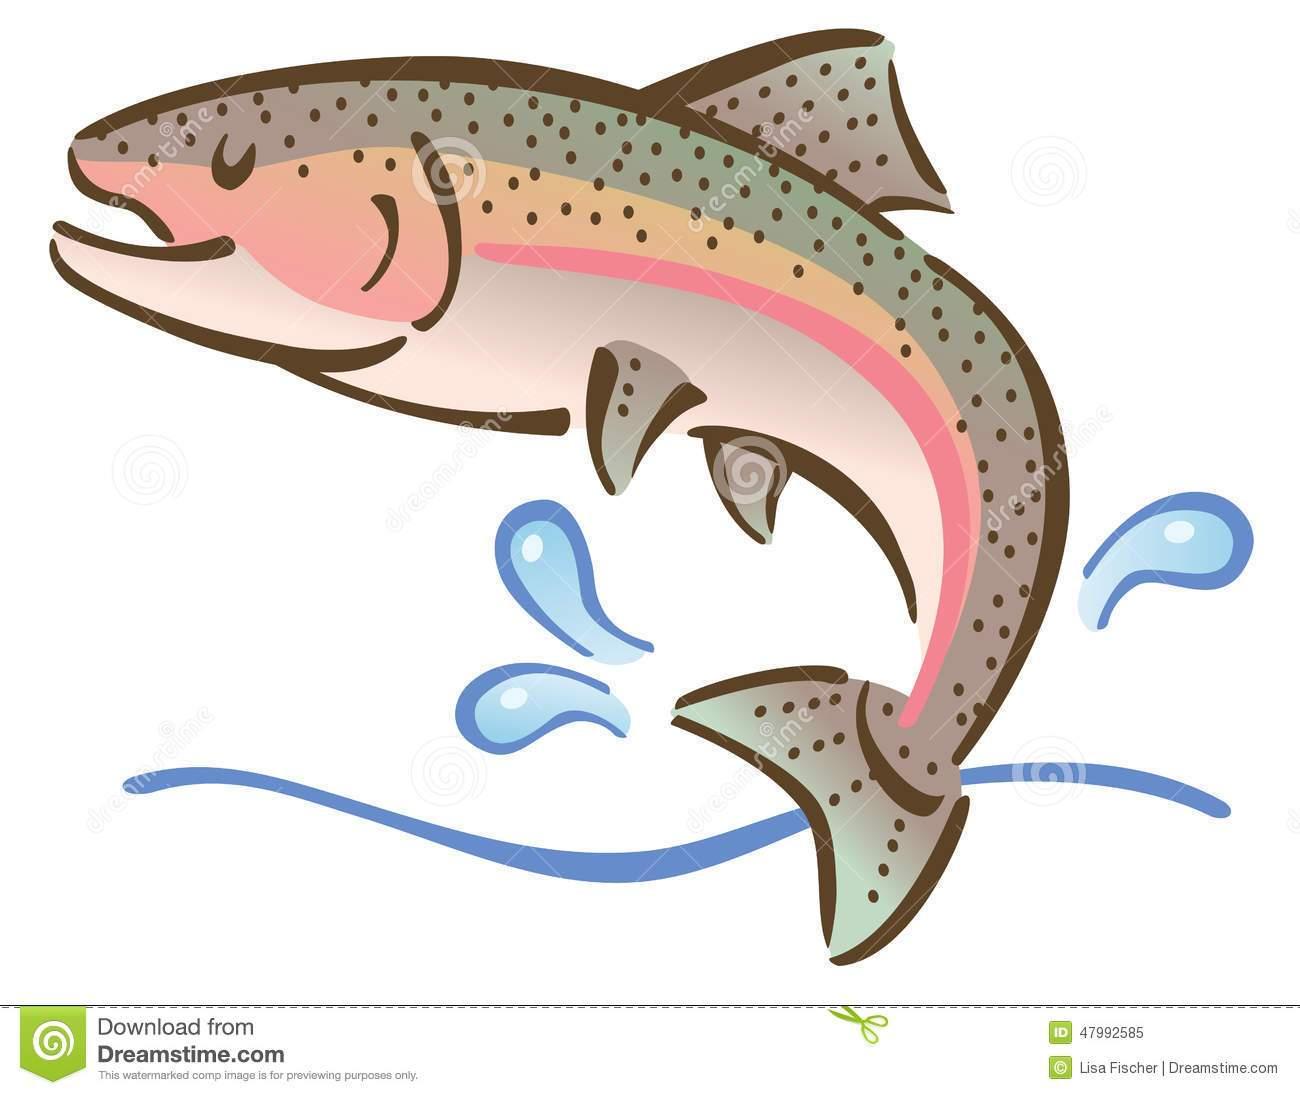 Jumping fish clipart » Clipart Portal.